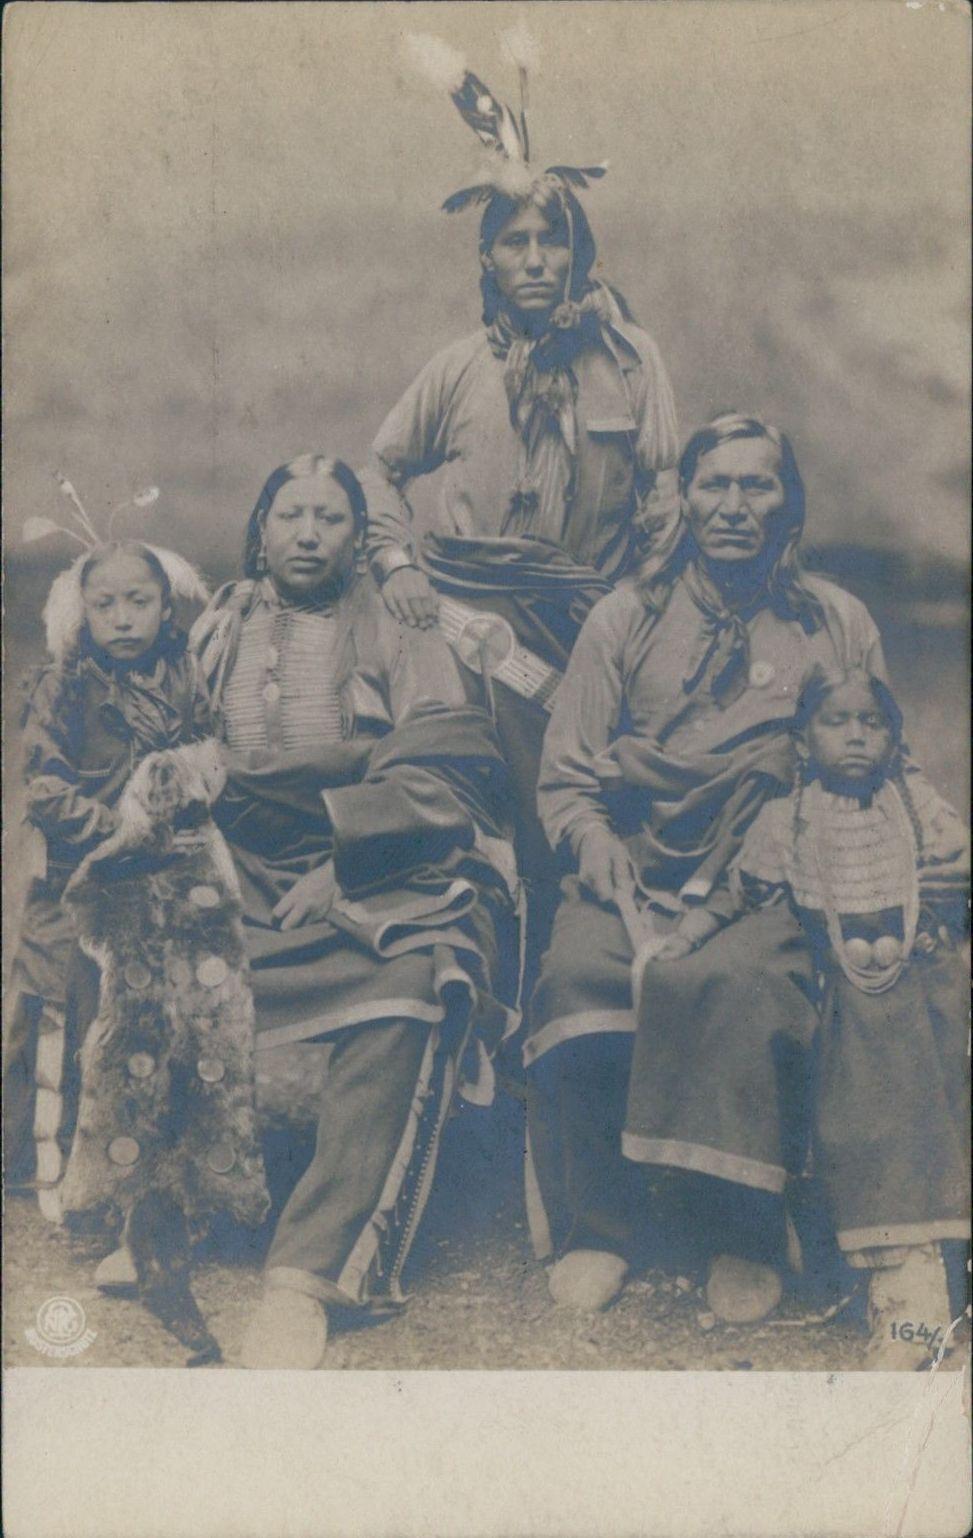 http://www.american-tribes.com/messageboards/dietmar/picketpin11.jpg